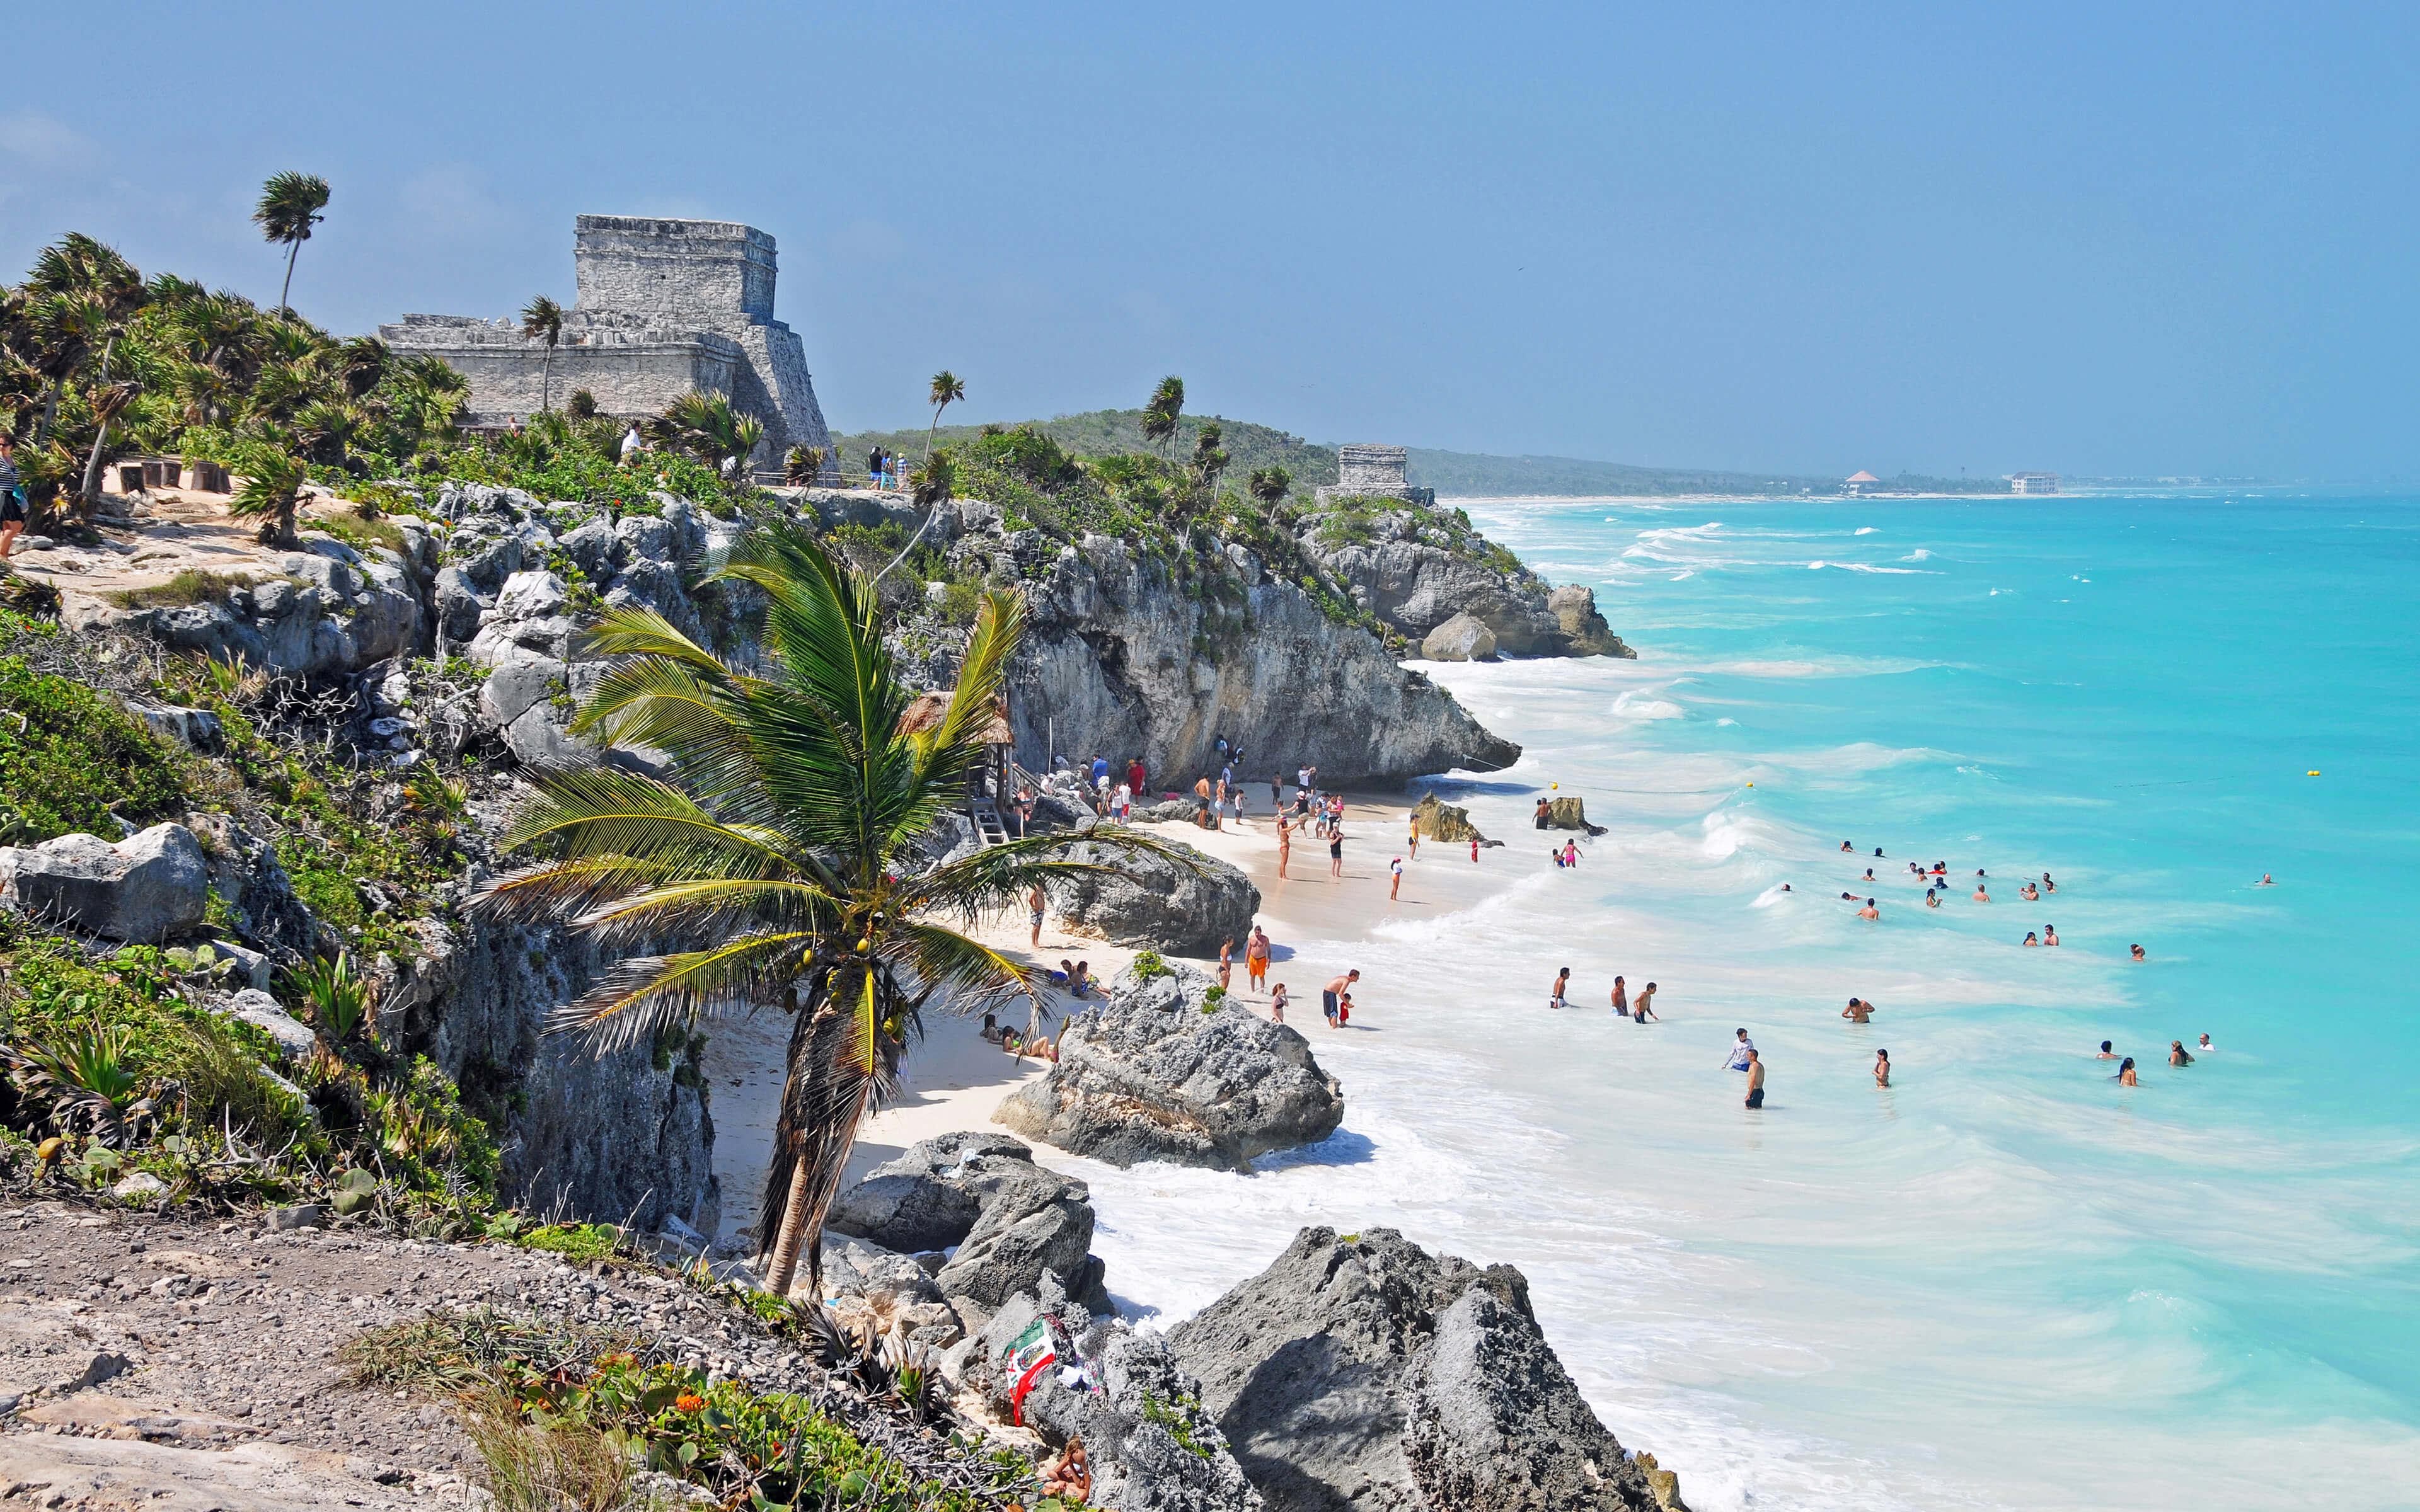 Beach Near El Castillo Tulum Riviera Maya Mexico Wallpaper 3840x2400